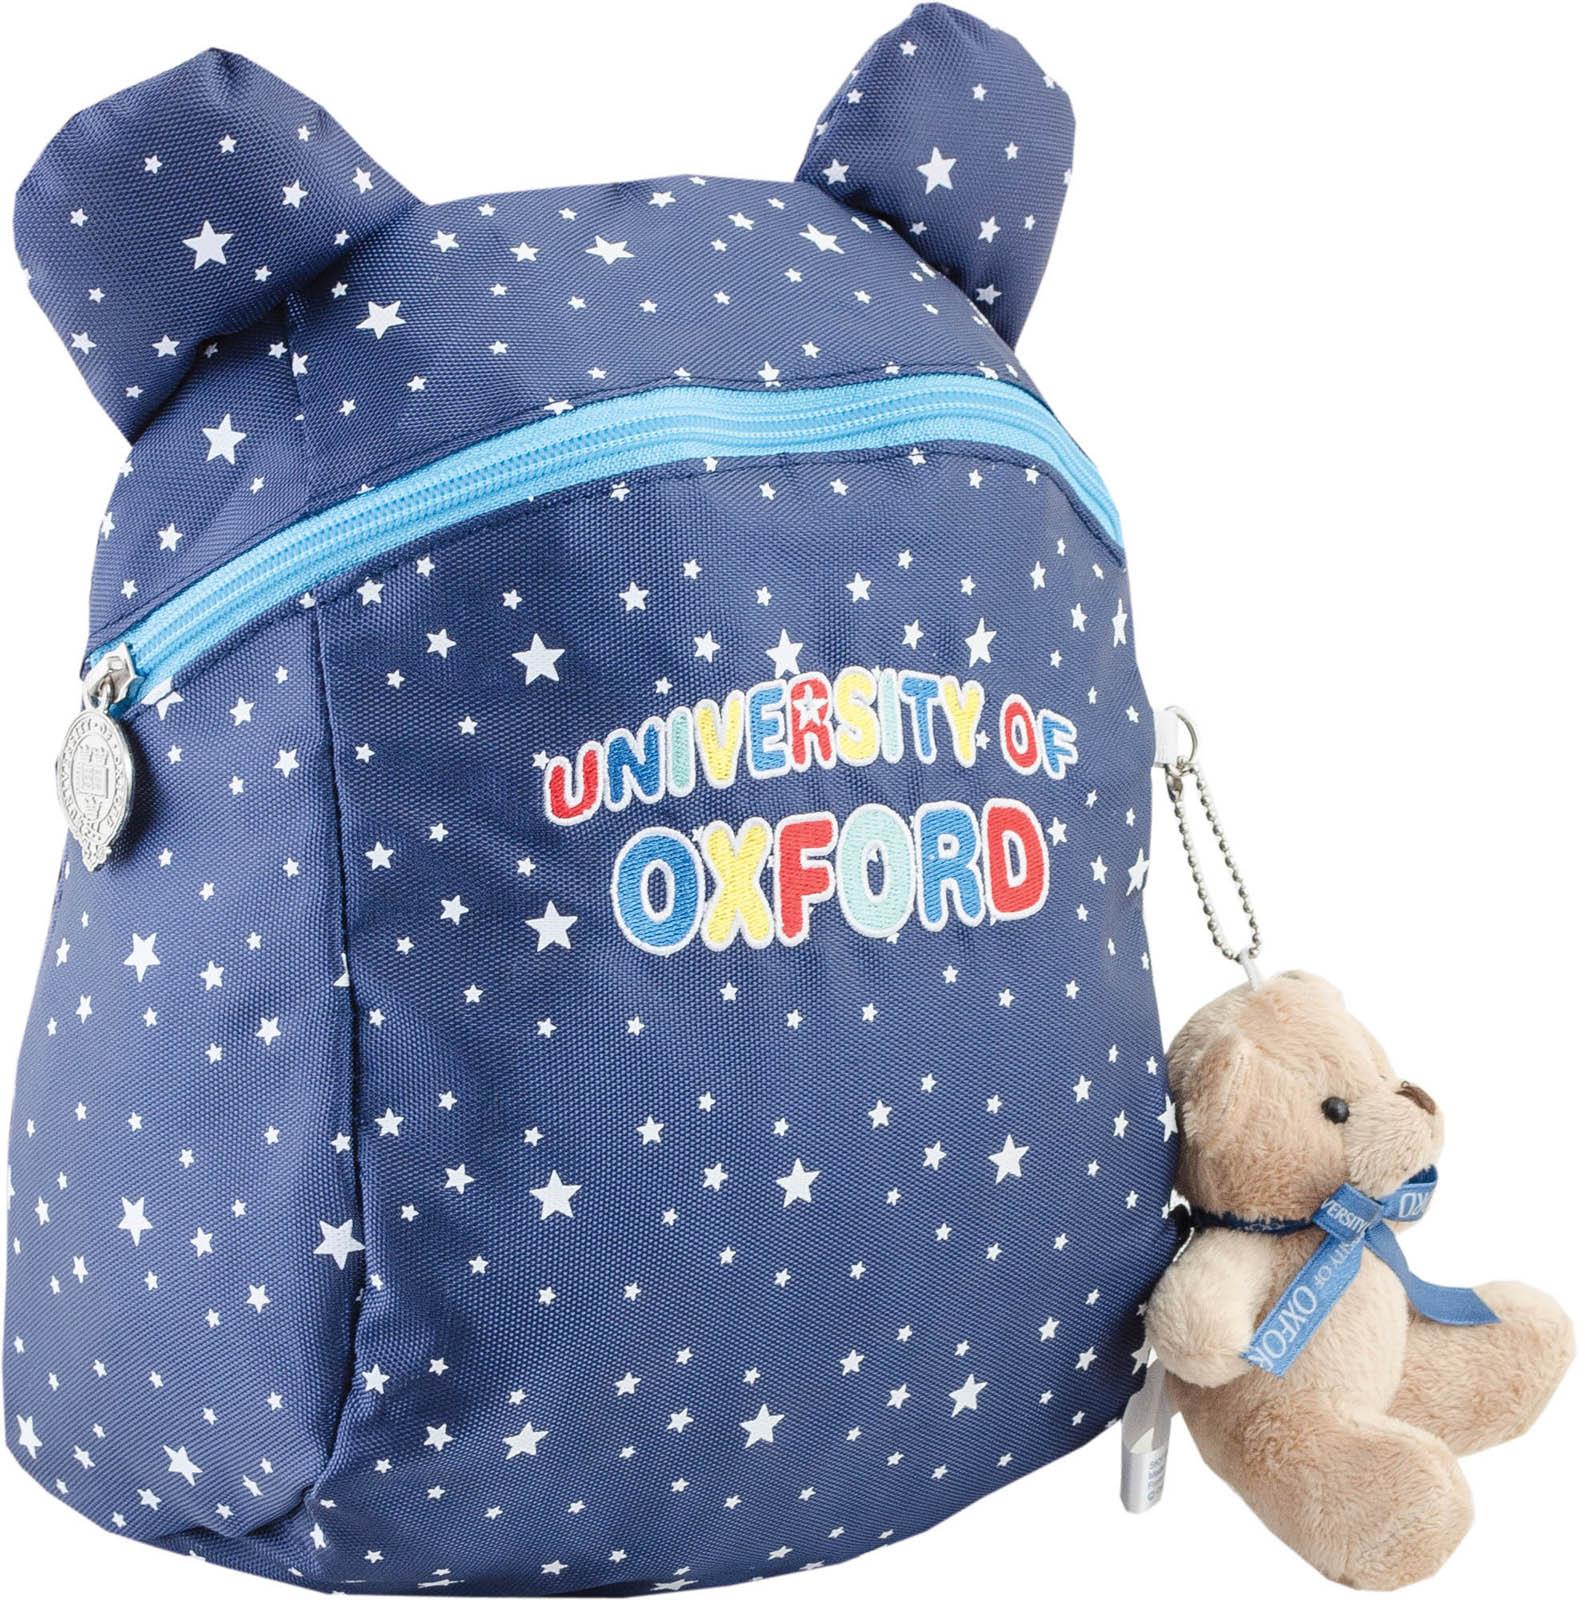 Рюкзак детский  YES  OX-17, синий, 20.5*28.5*9.5